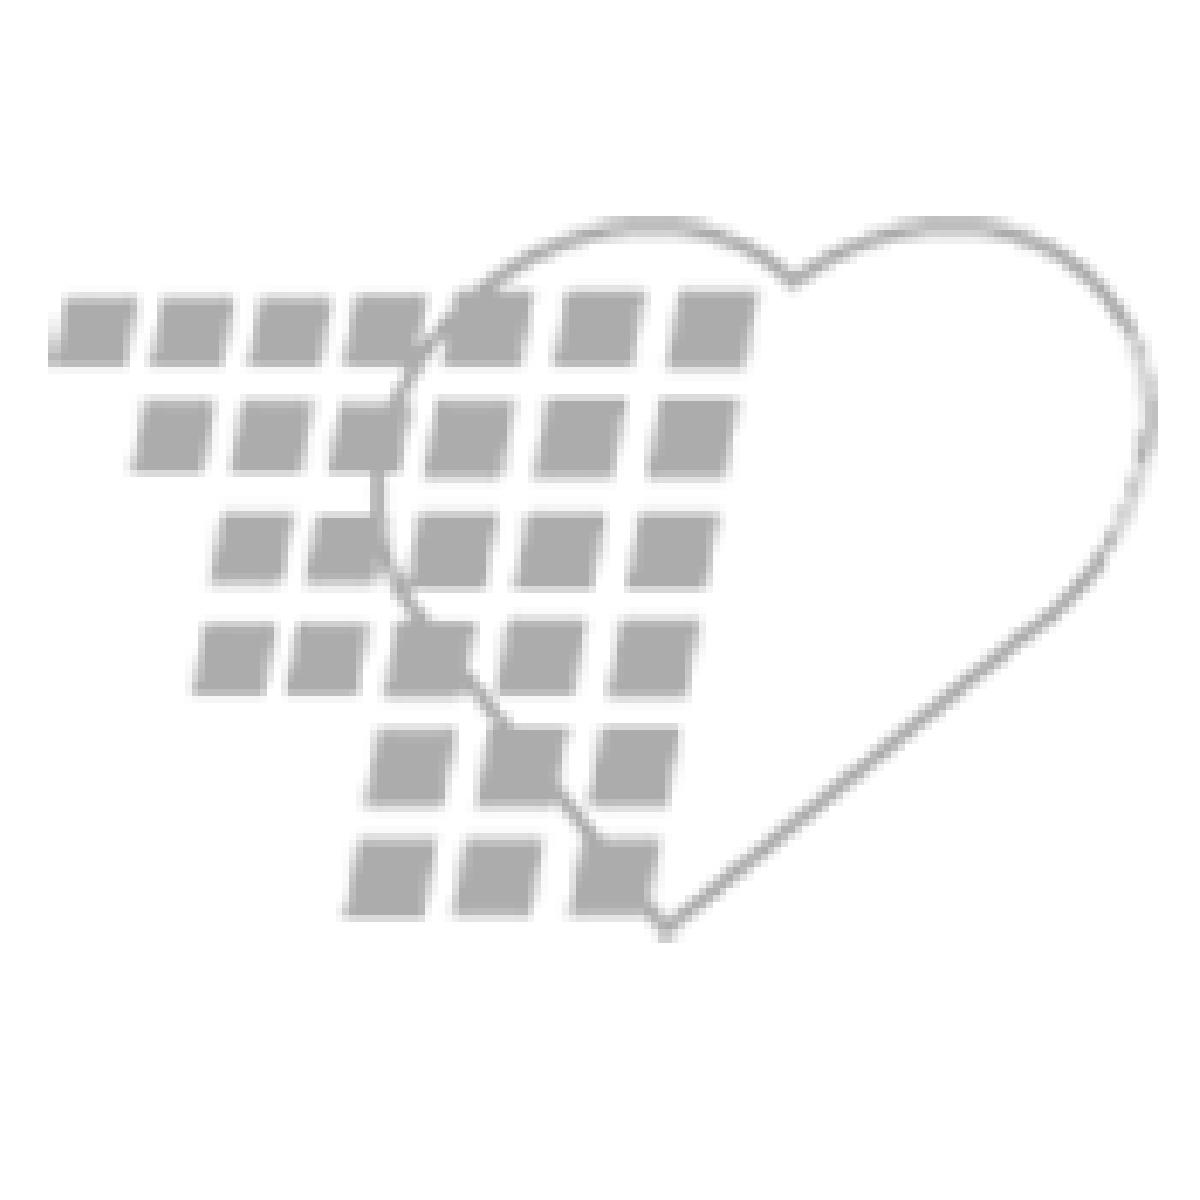 02-08-0410 Sim Vitals 5 Line Monitor For Smart Stat